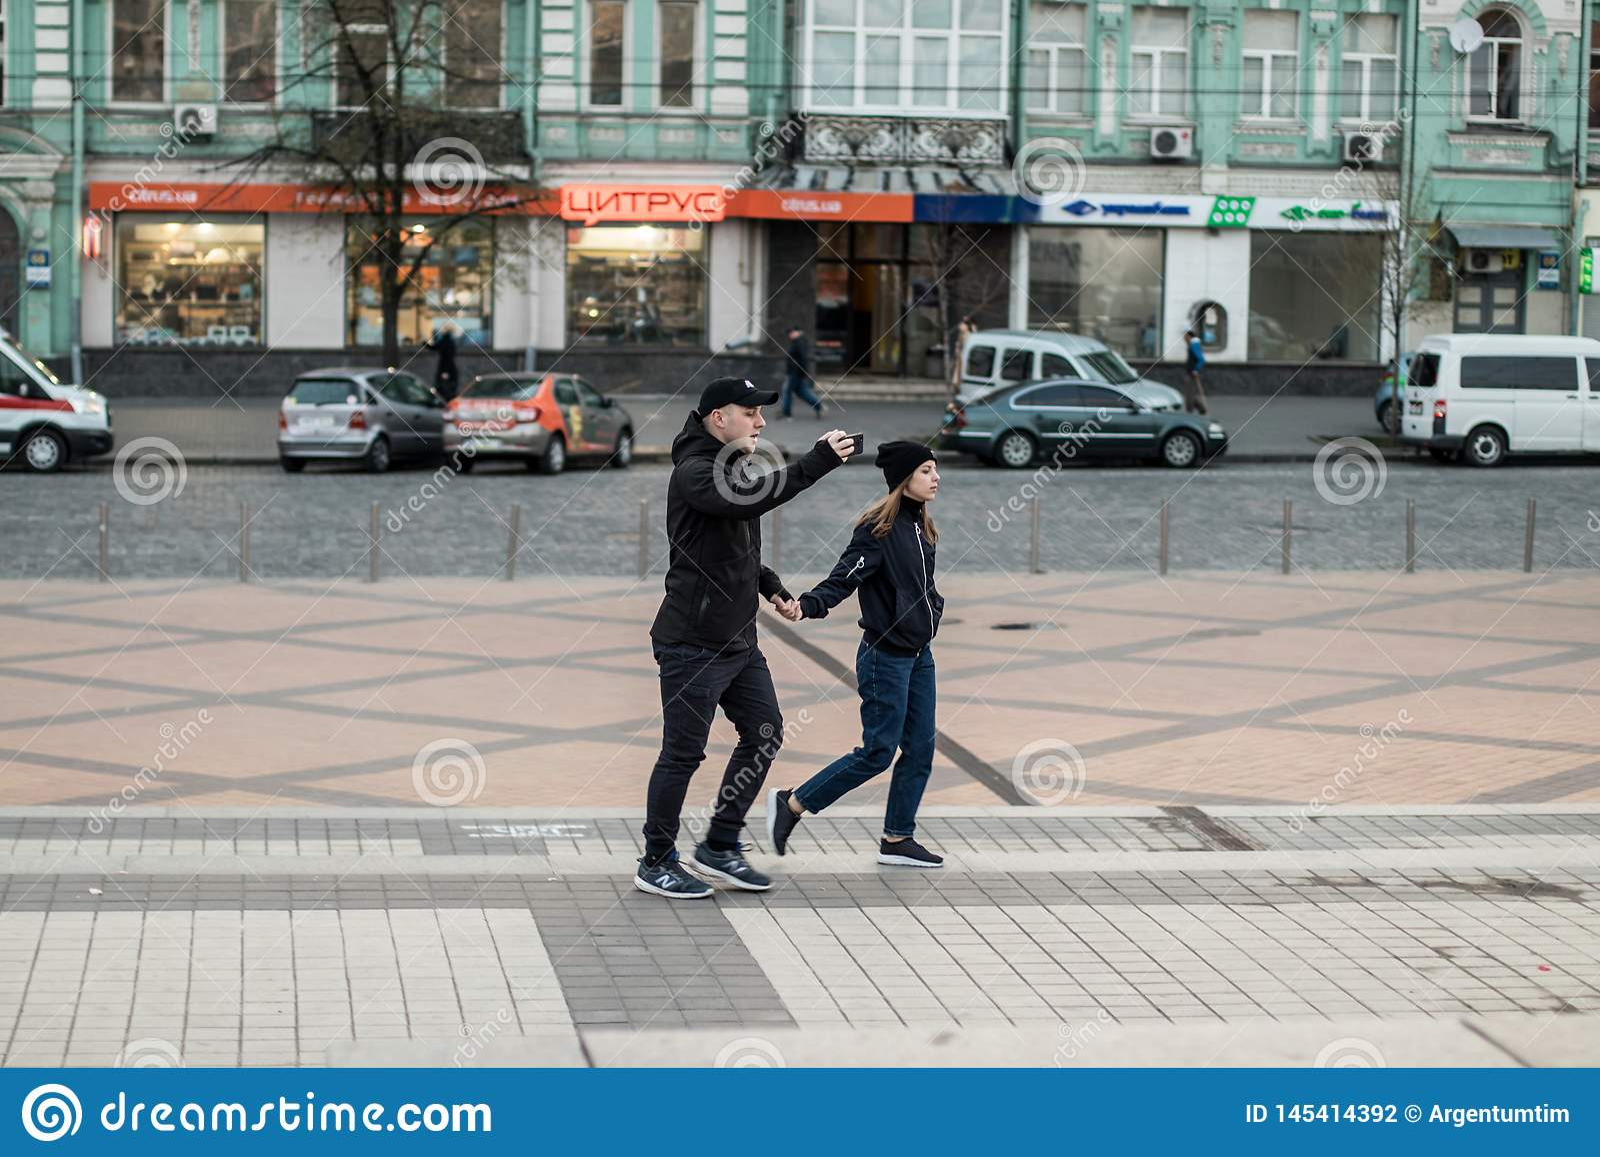 Kyiv, Ukraine 19 apr 2019. UA Presidential Debate 2019. Kyiv Olympiyskiy Stadium